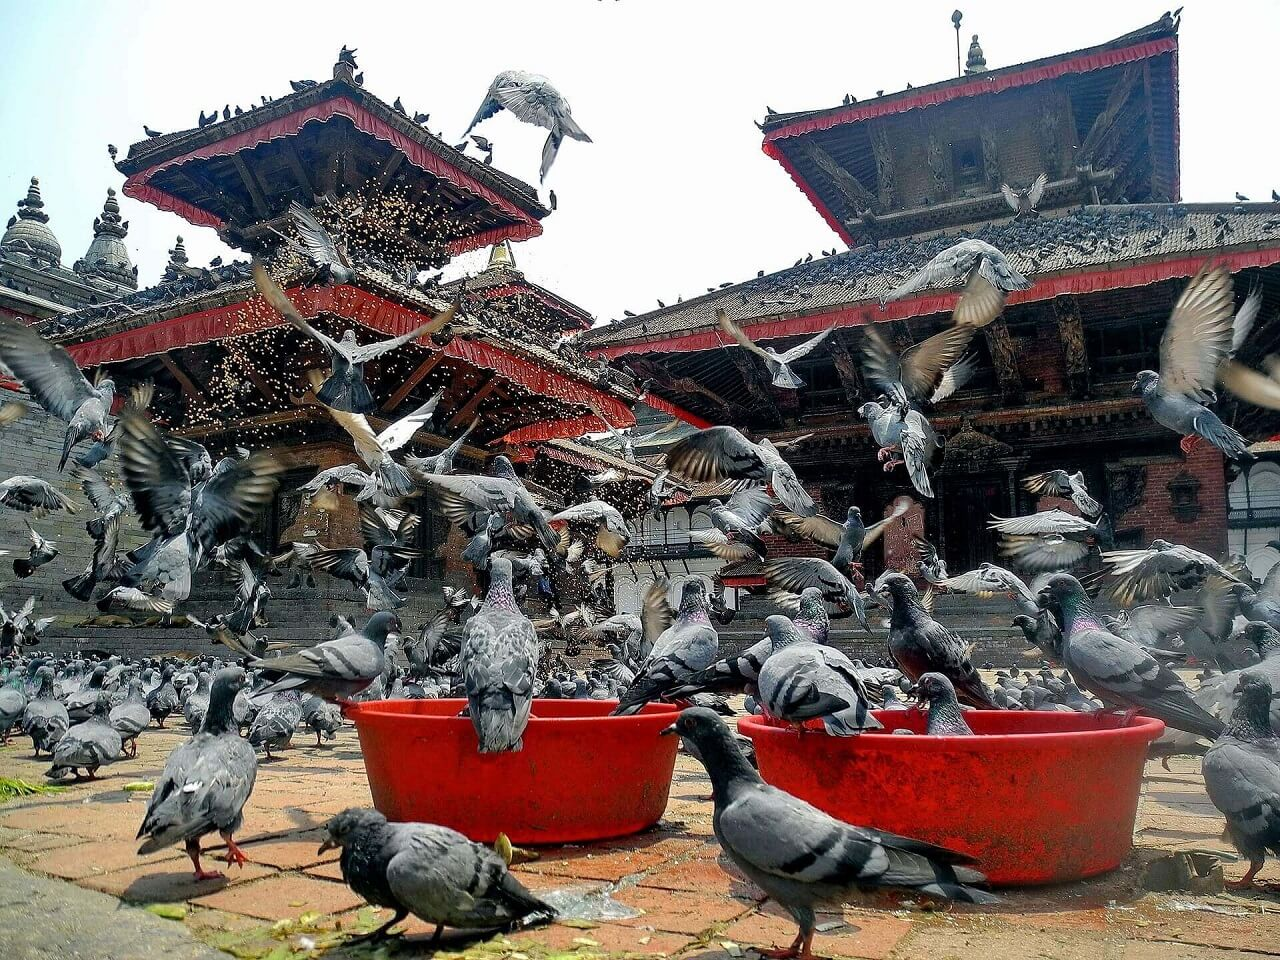 Kathmandu Durbar Squares and the Pegions